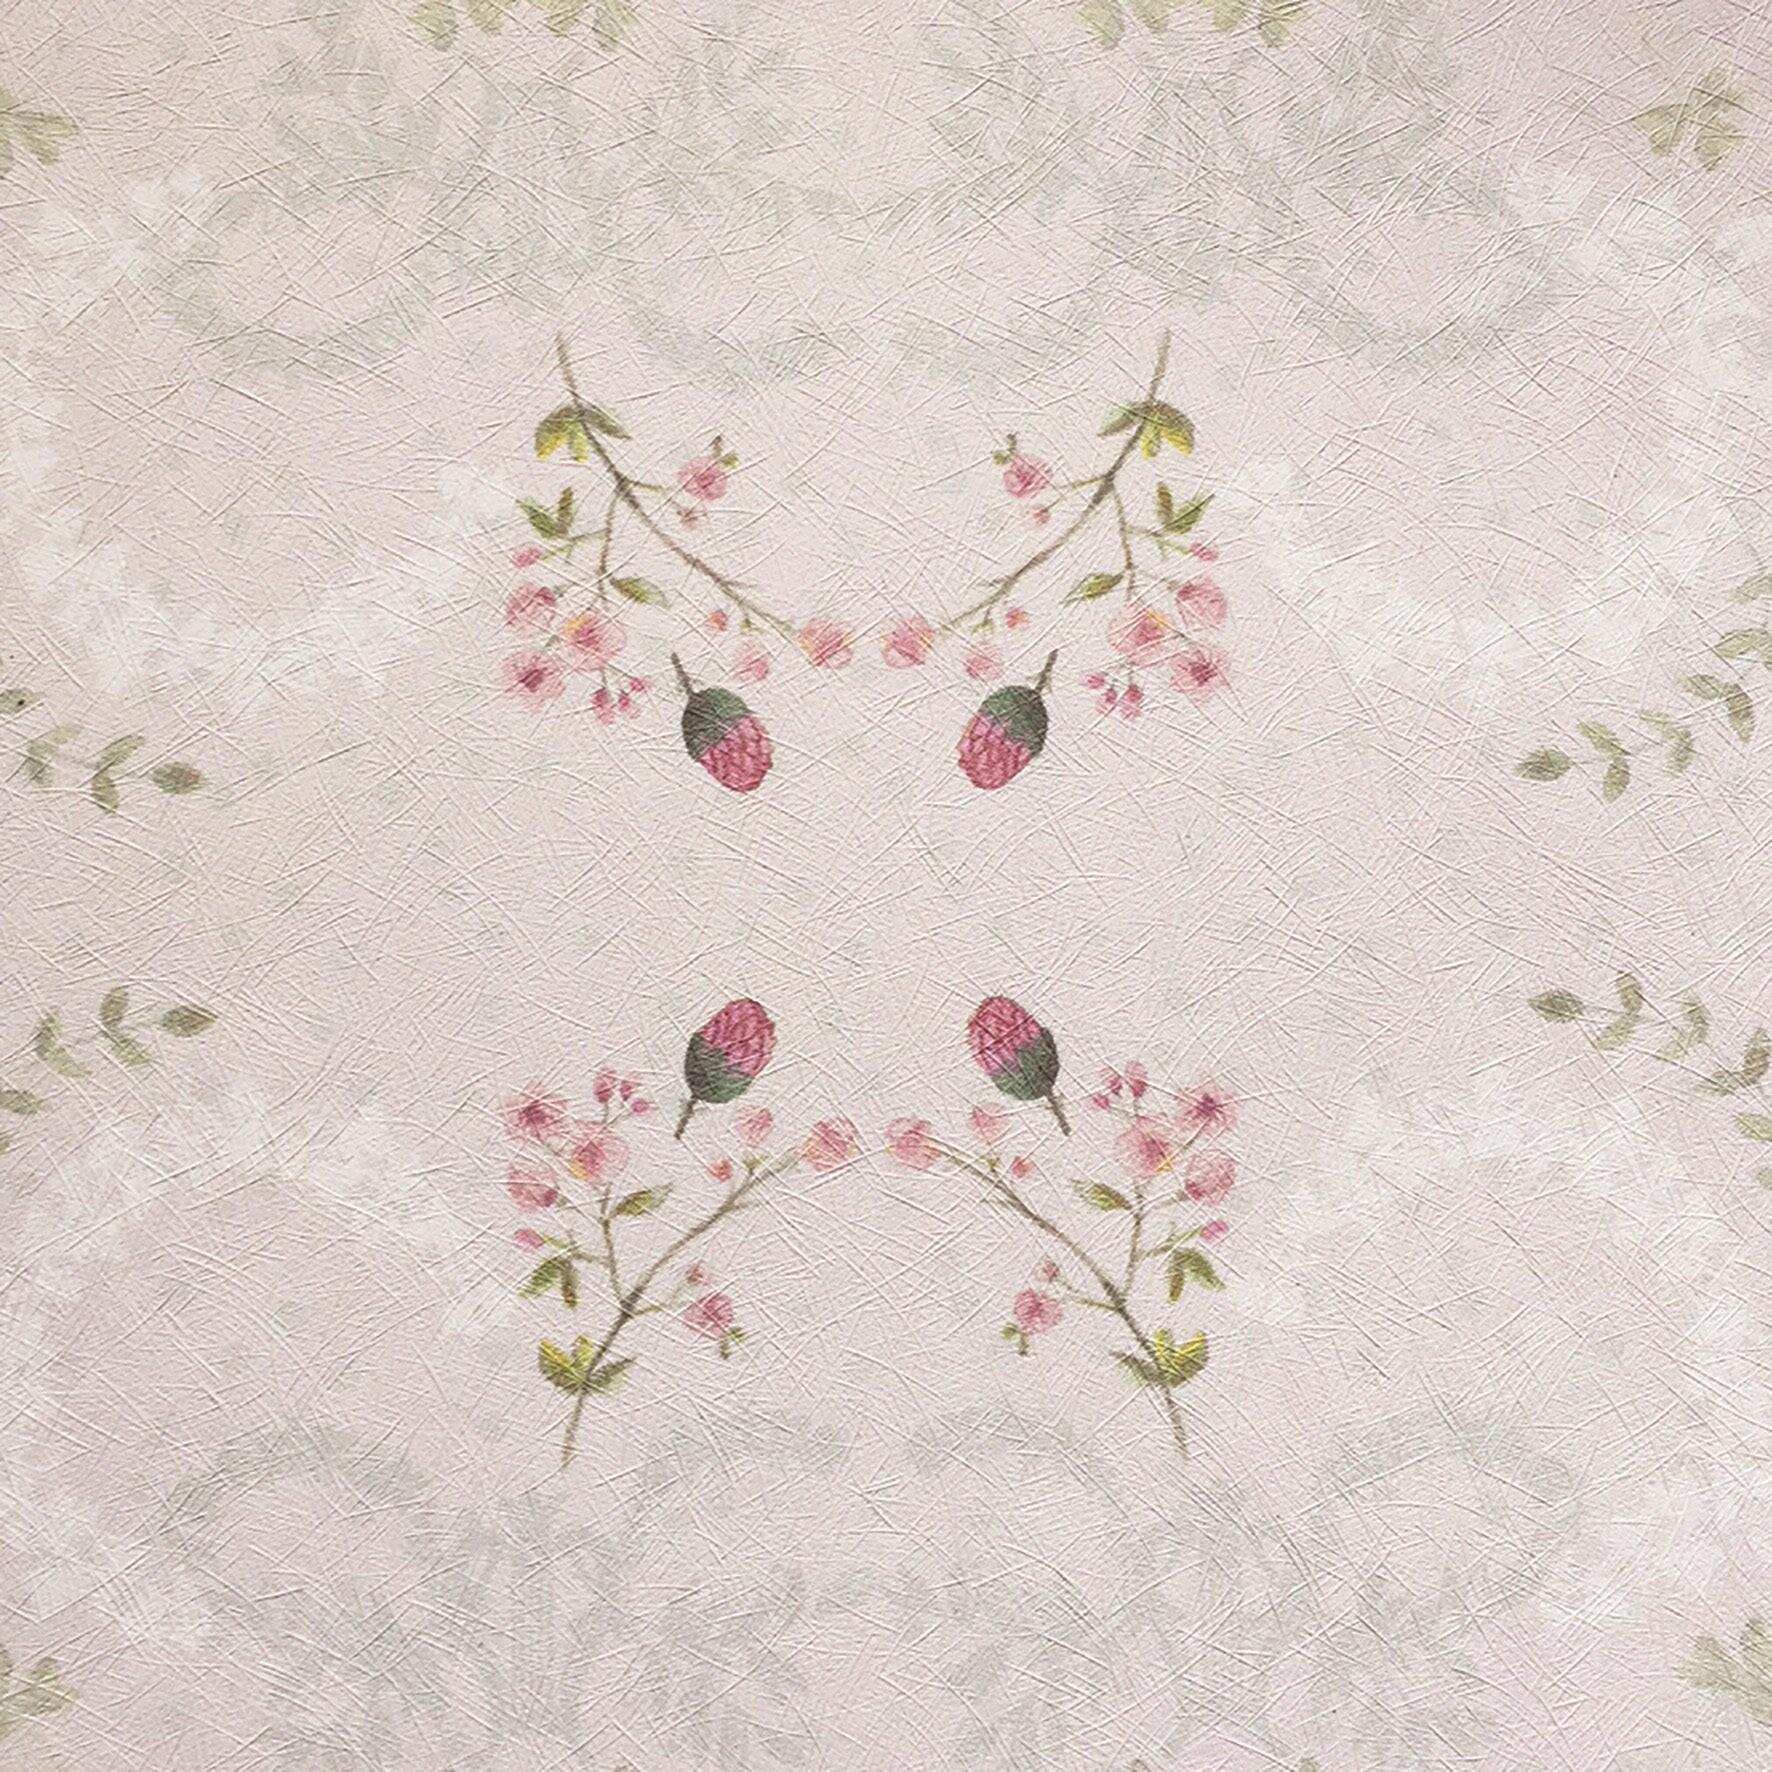 Delicate Pink Wallpaper Vintage Floral Wallpaper Textured Etsy